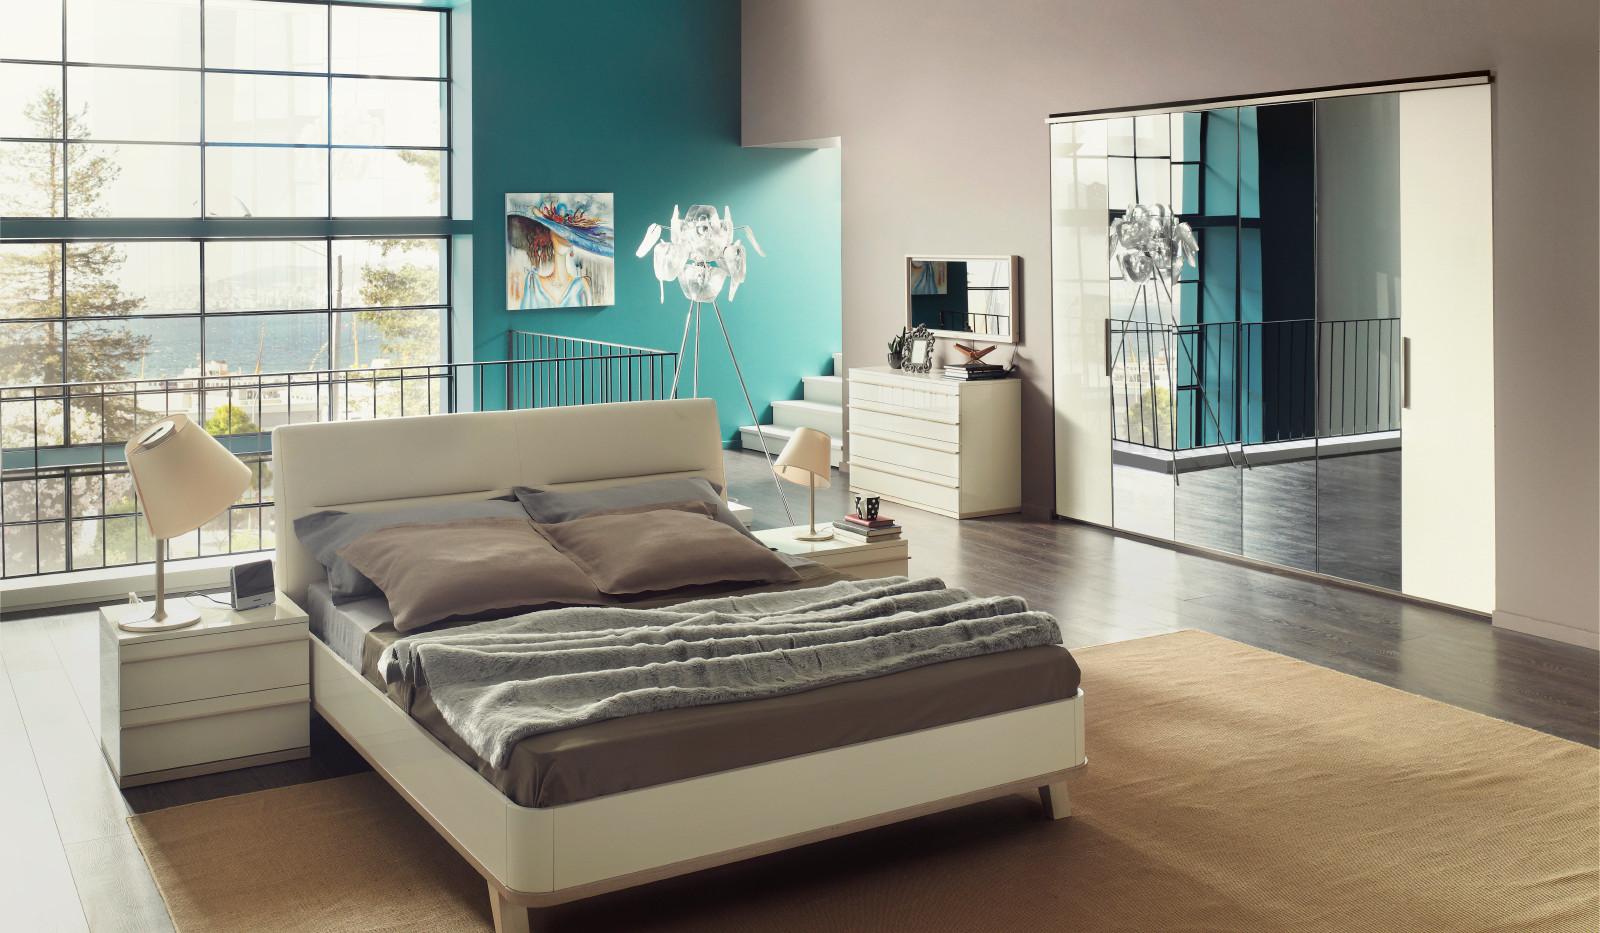 Yataş Bedding & Enza Home